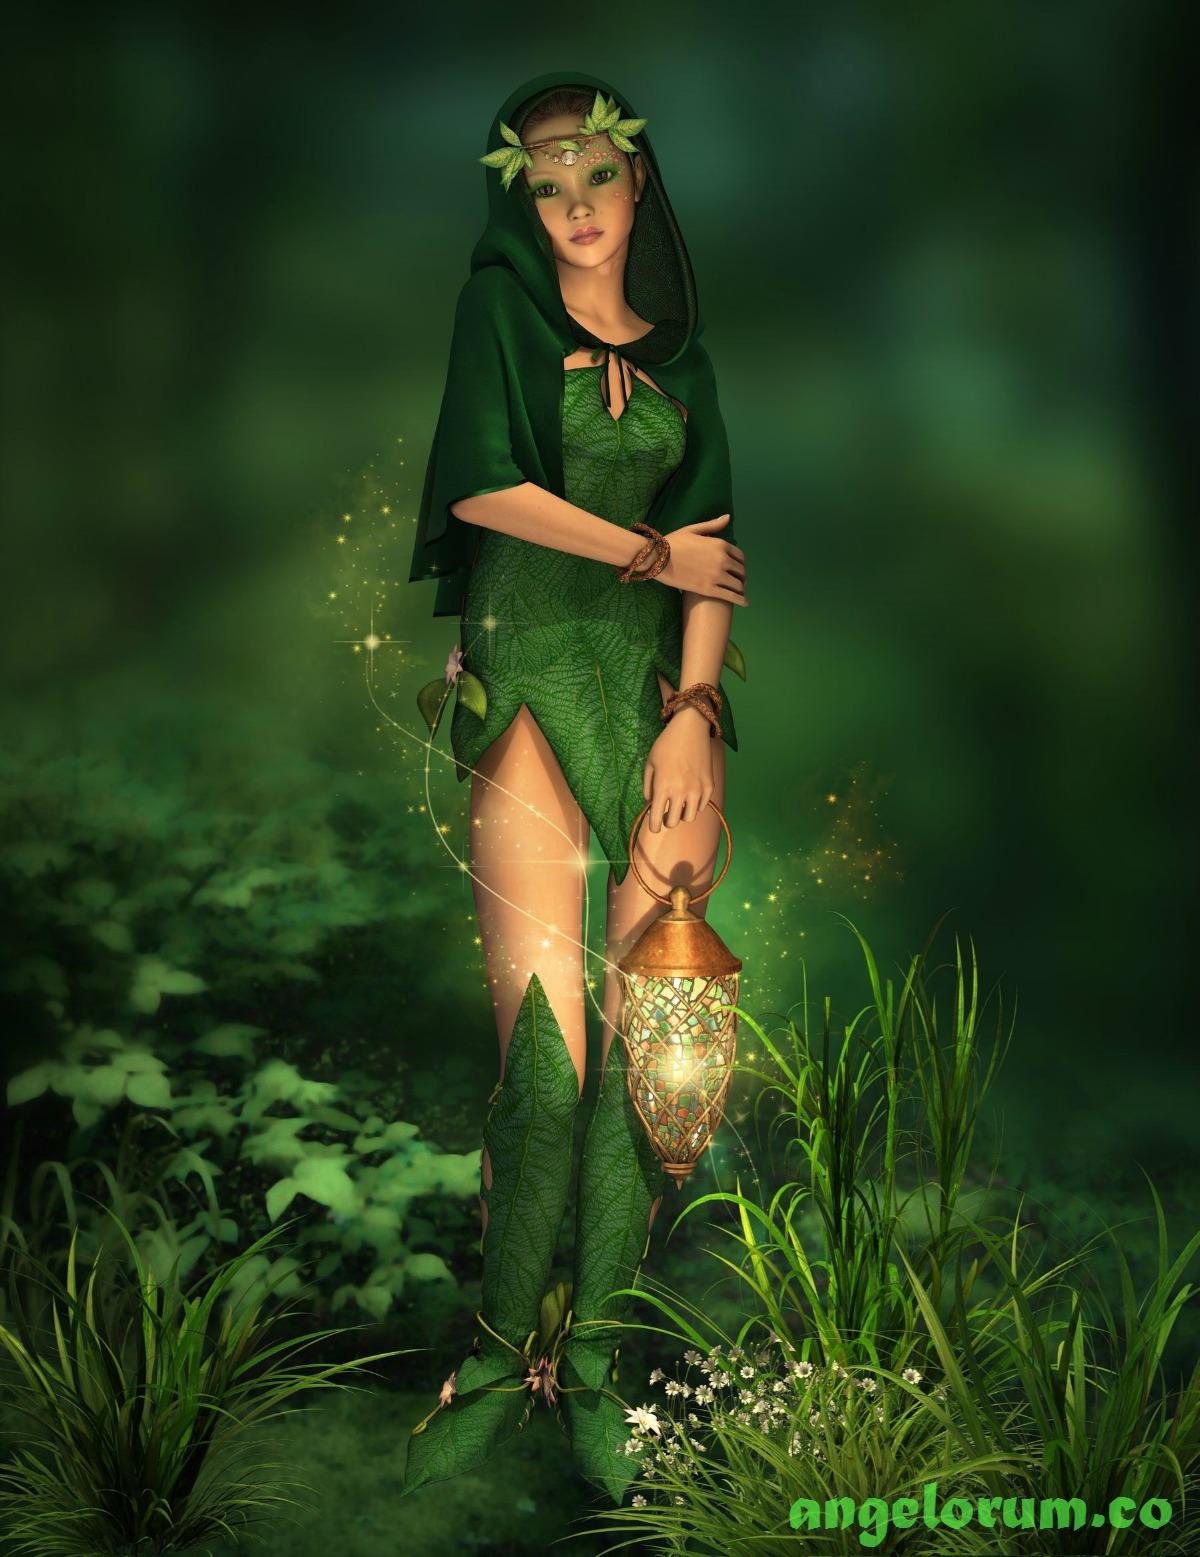 green fairy angelorum